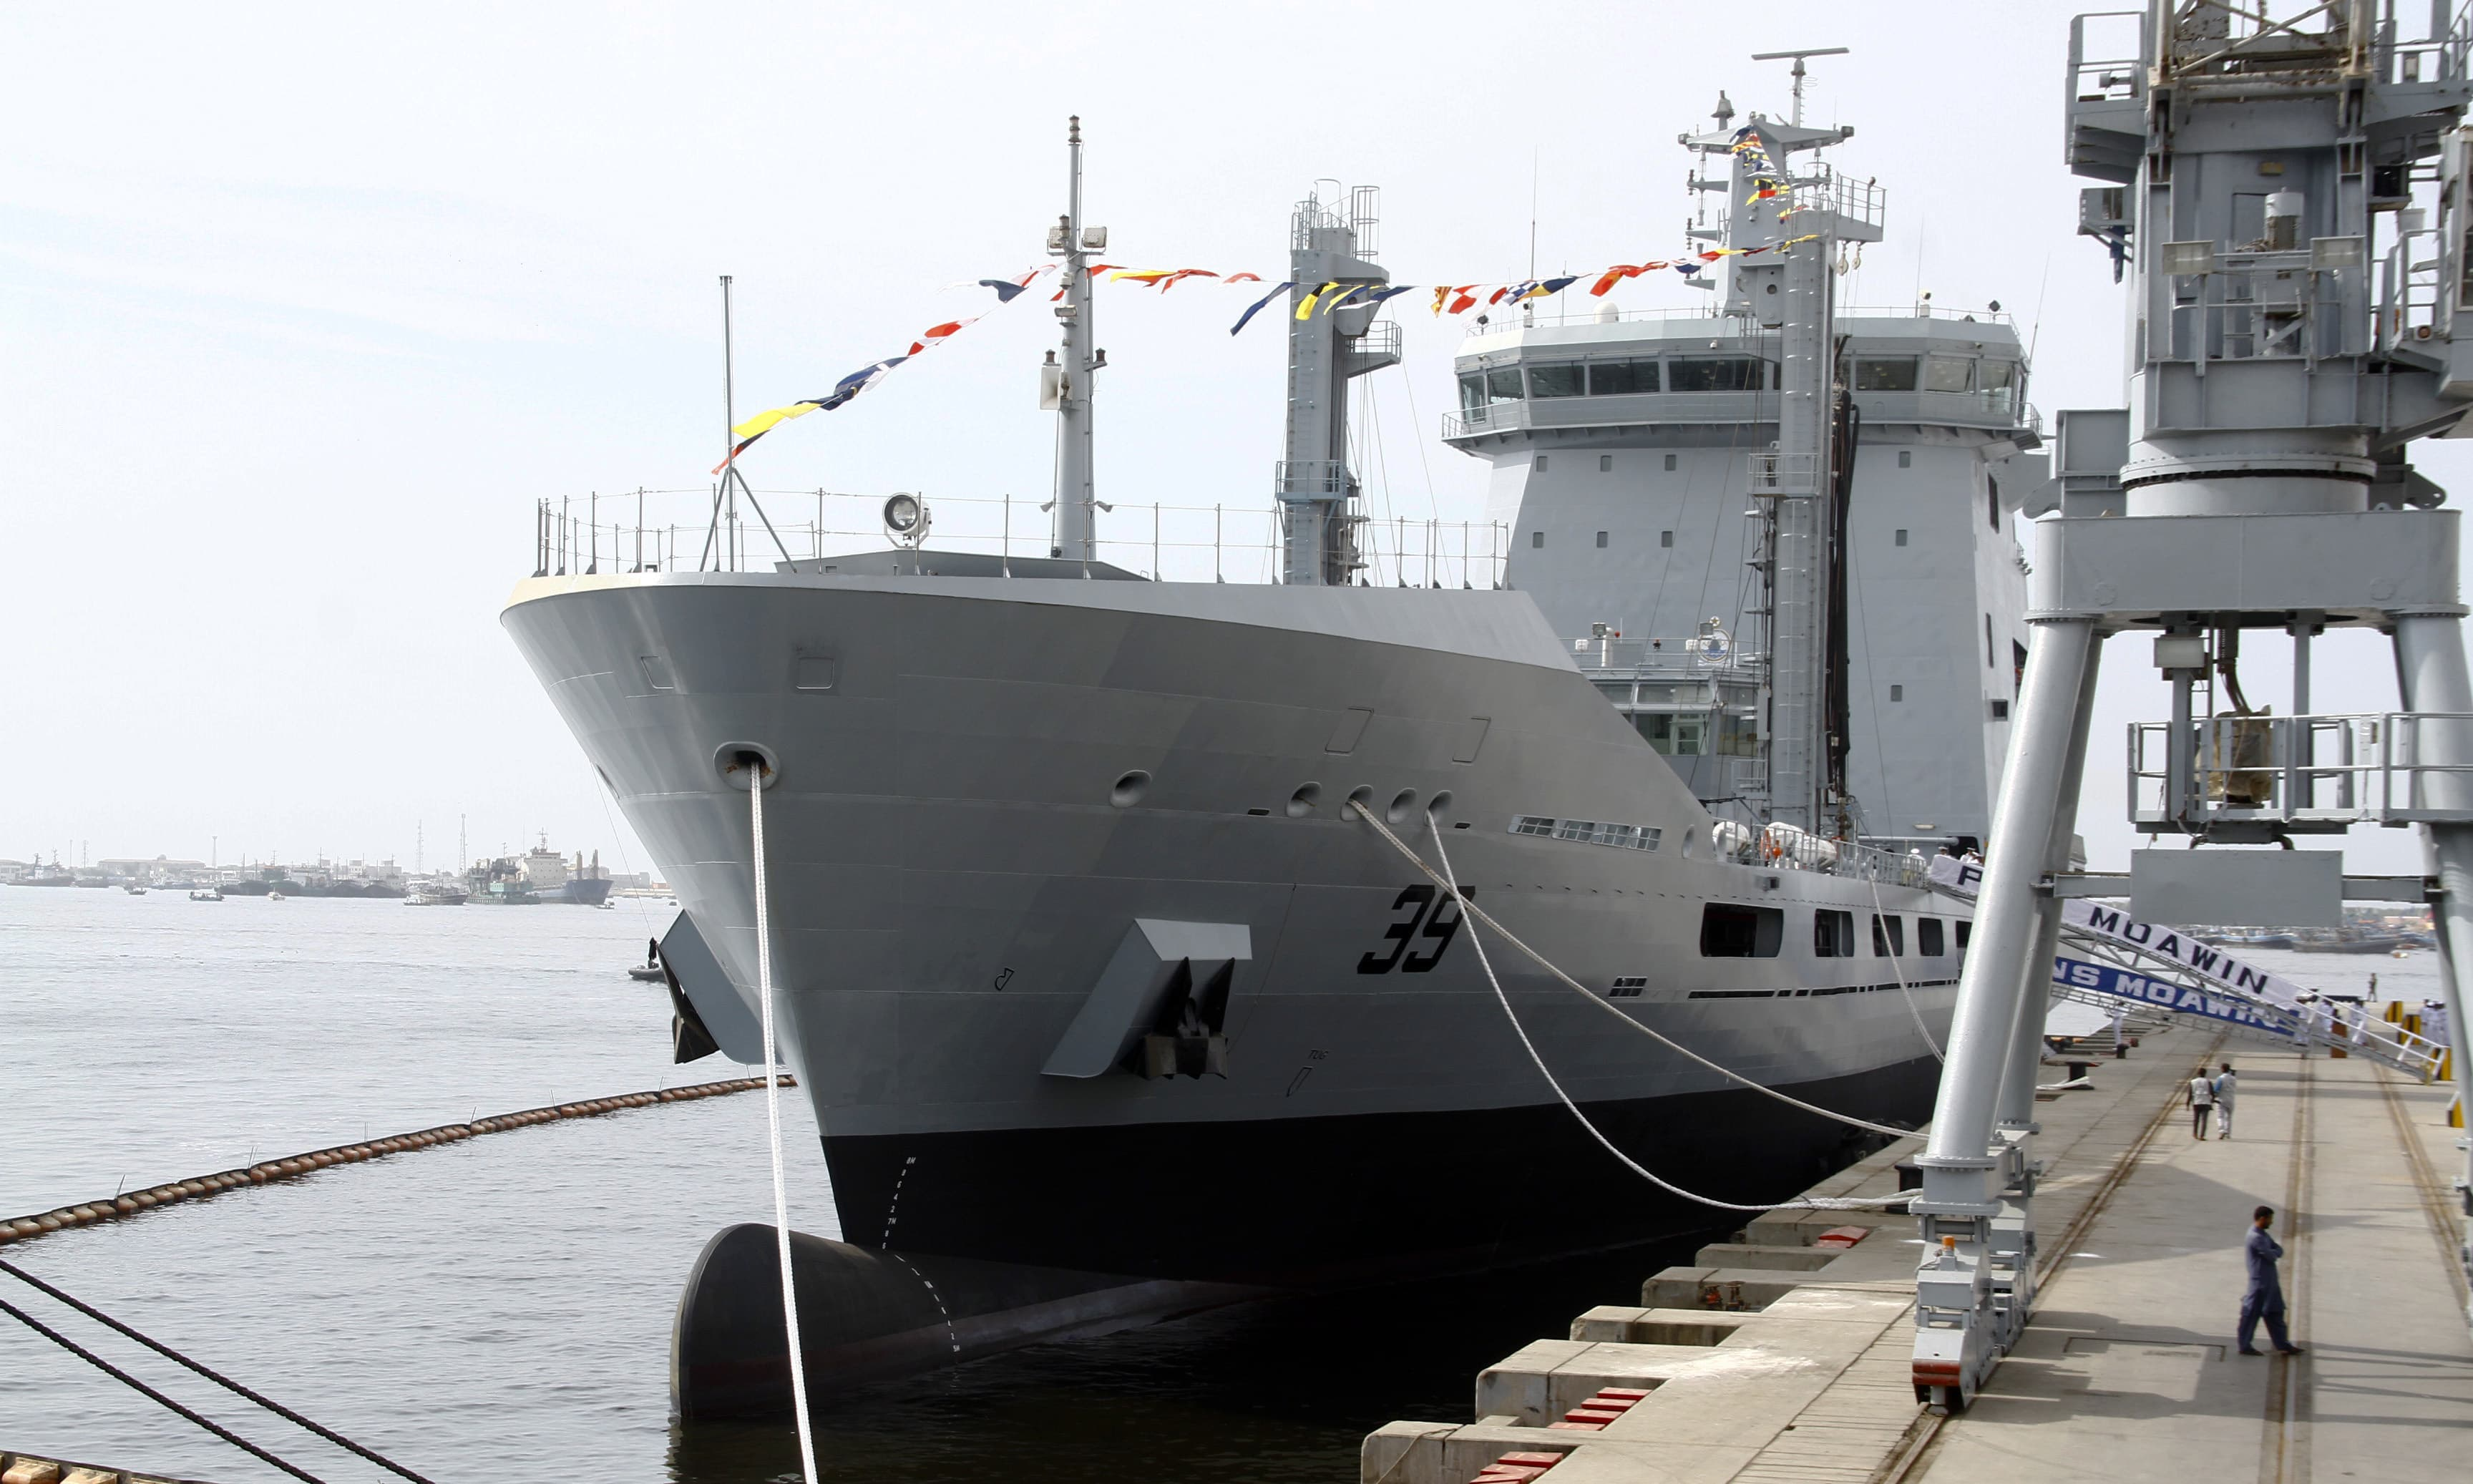 Navy commissions indigenously built 17,000-tonne fleet tanker